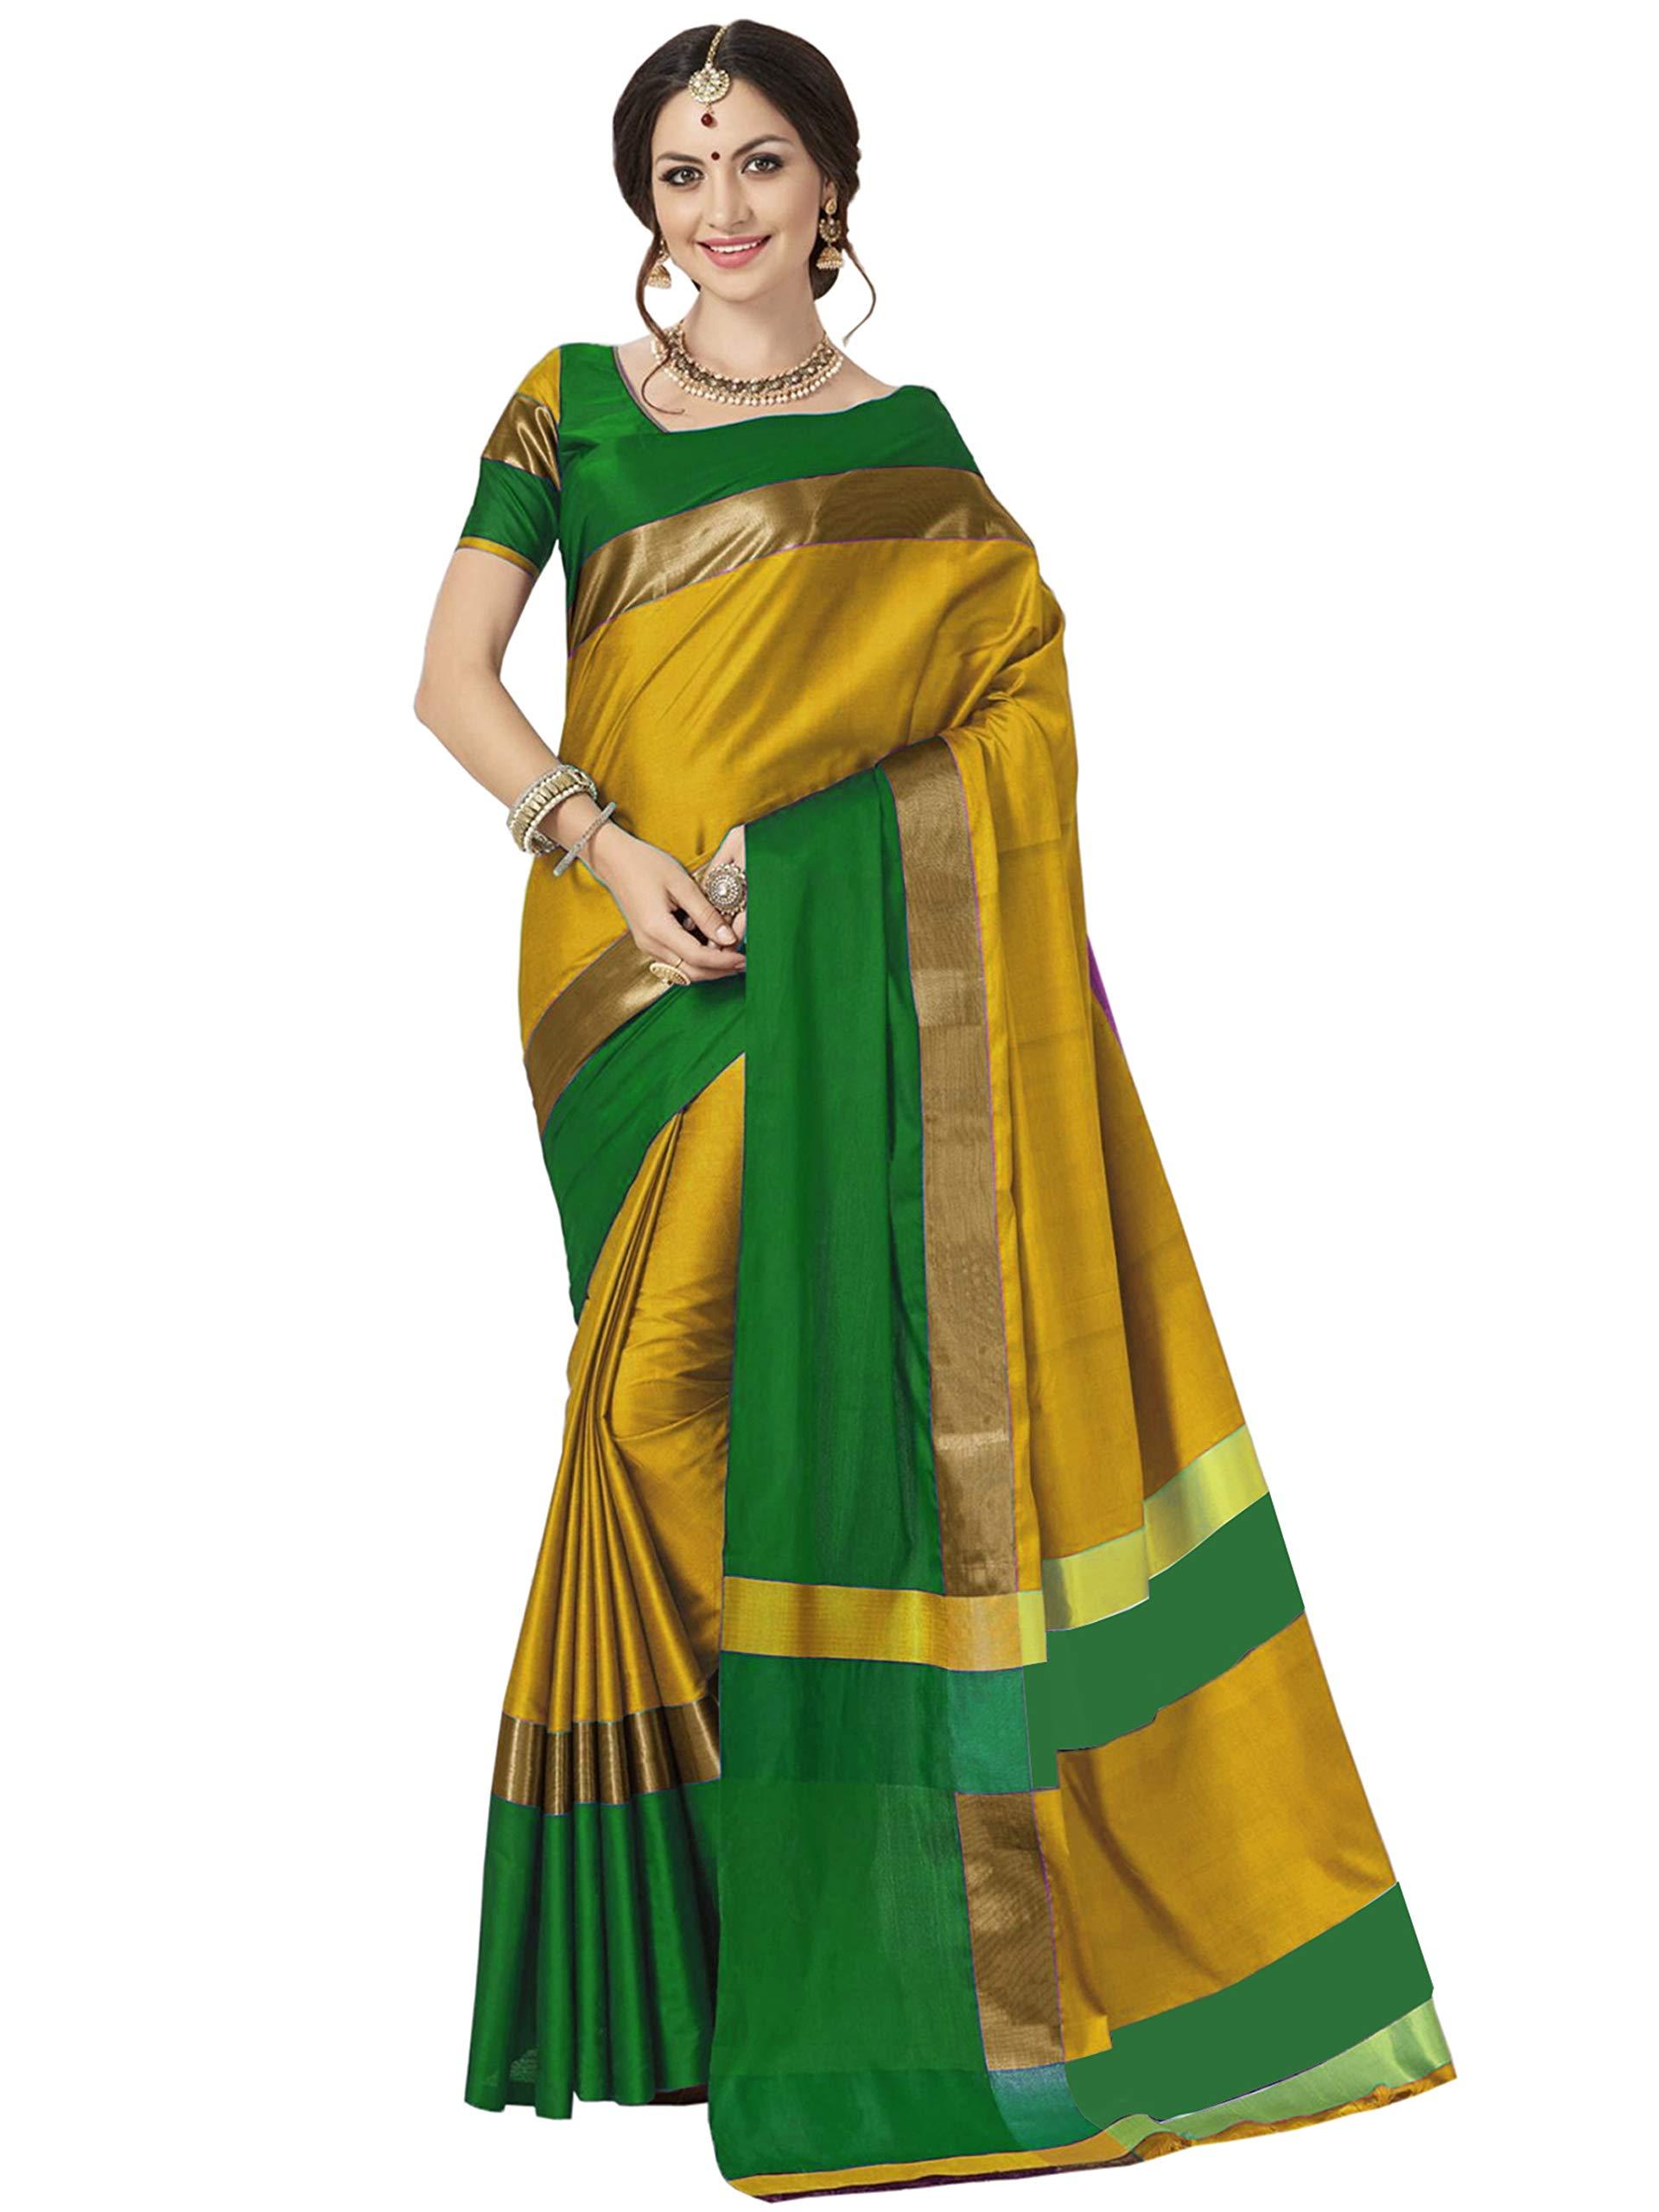 ELINA FASHION Sarees for Women Cotton Silk Woven Saree l Indian Diwali Gift Sari with Unstitched Blouse